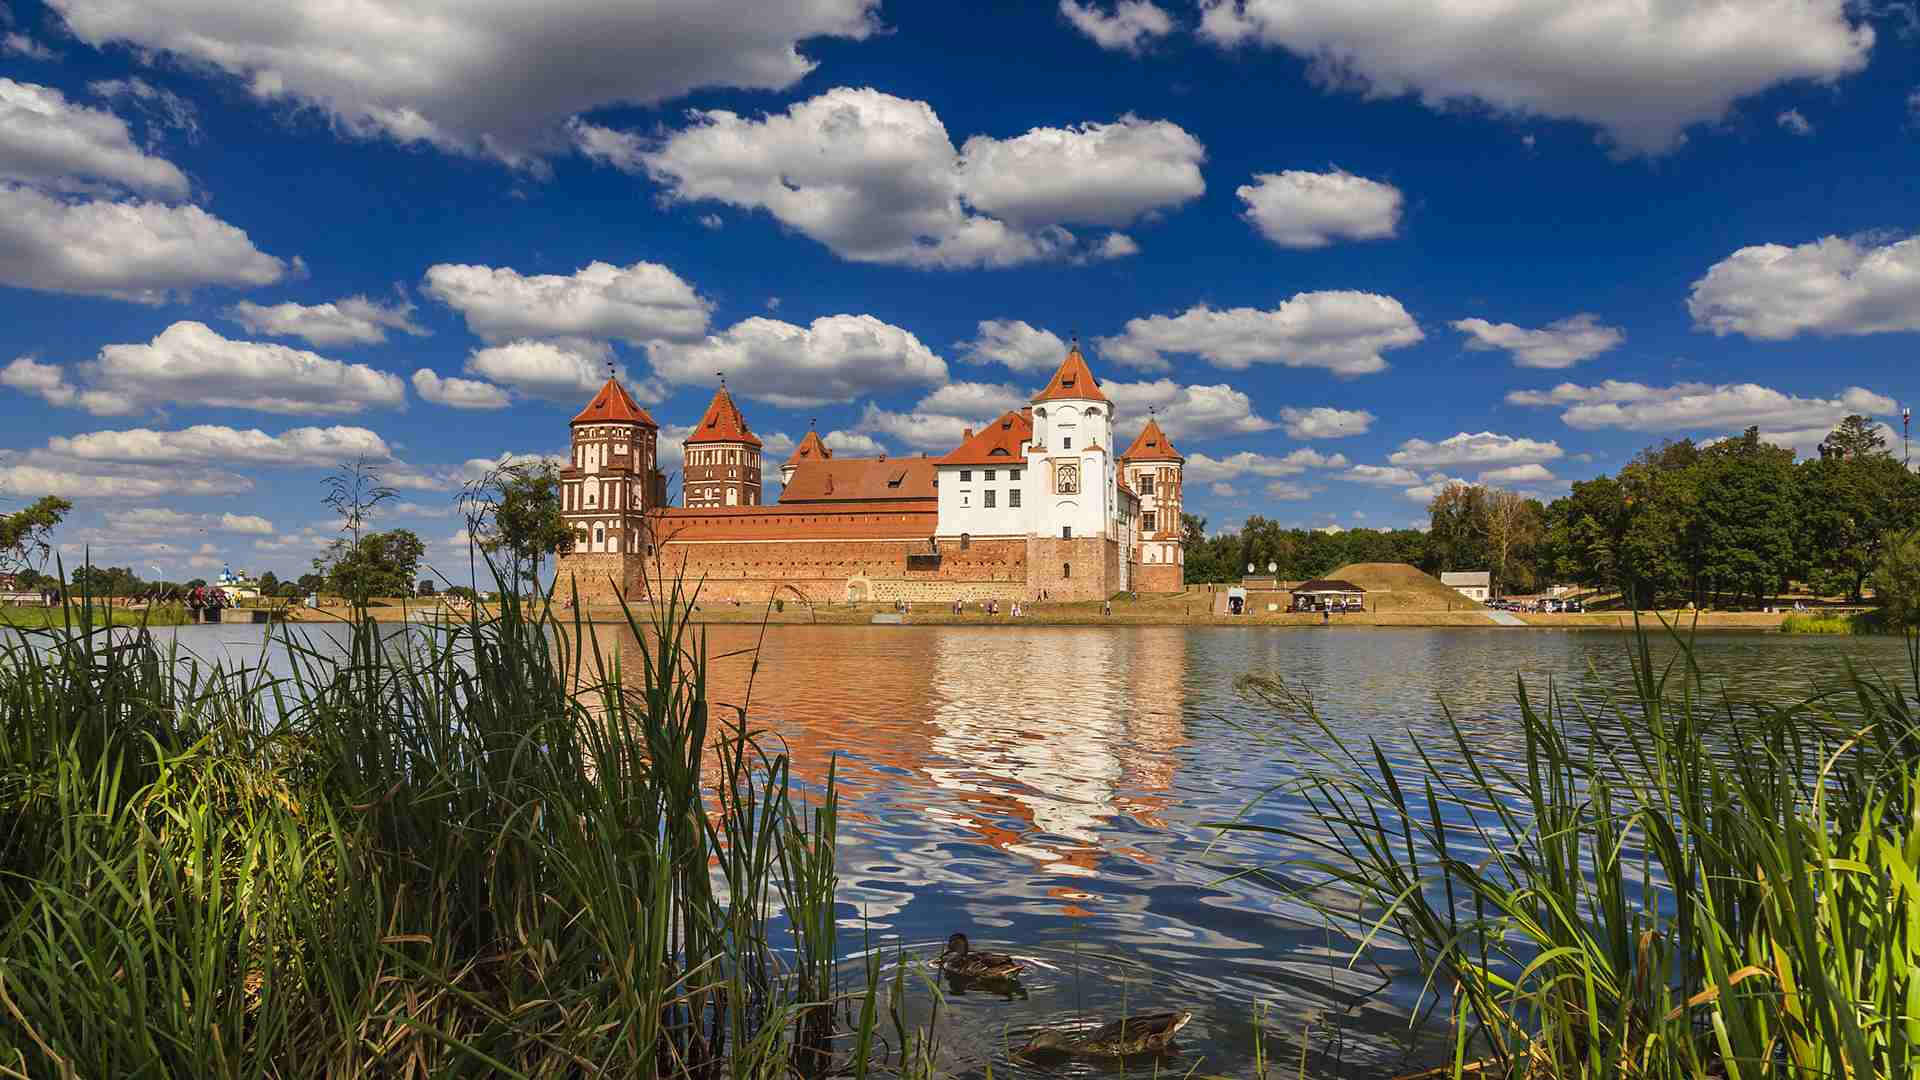 Картинки из белоруссии, открытки